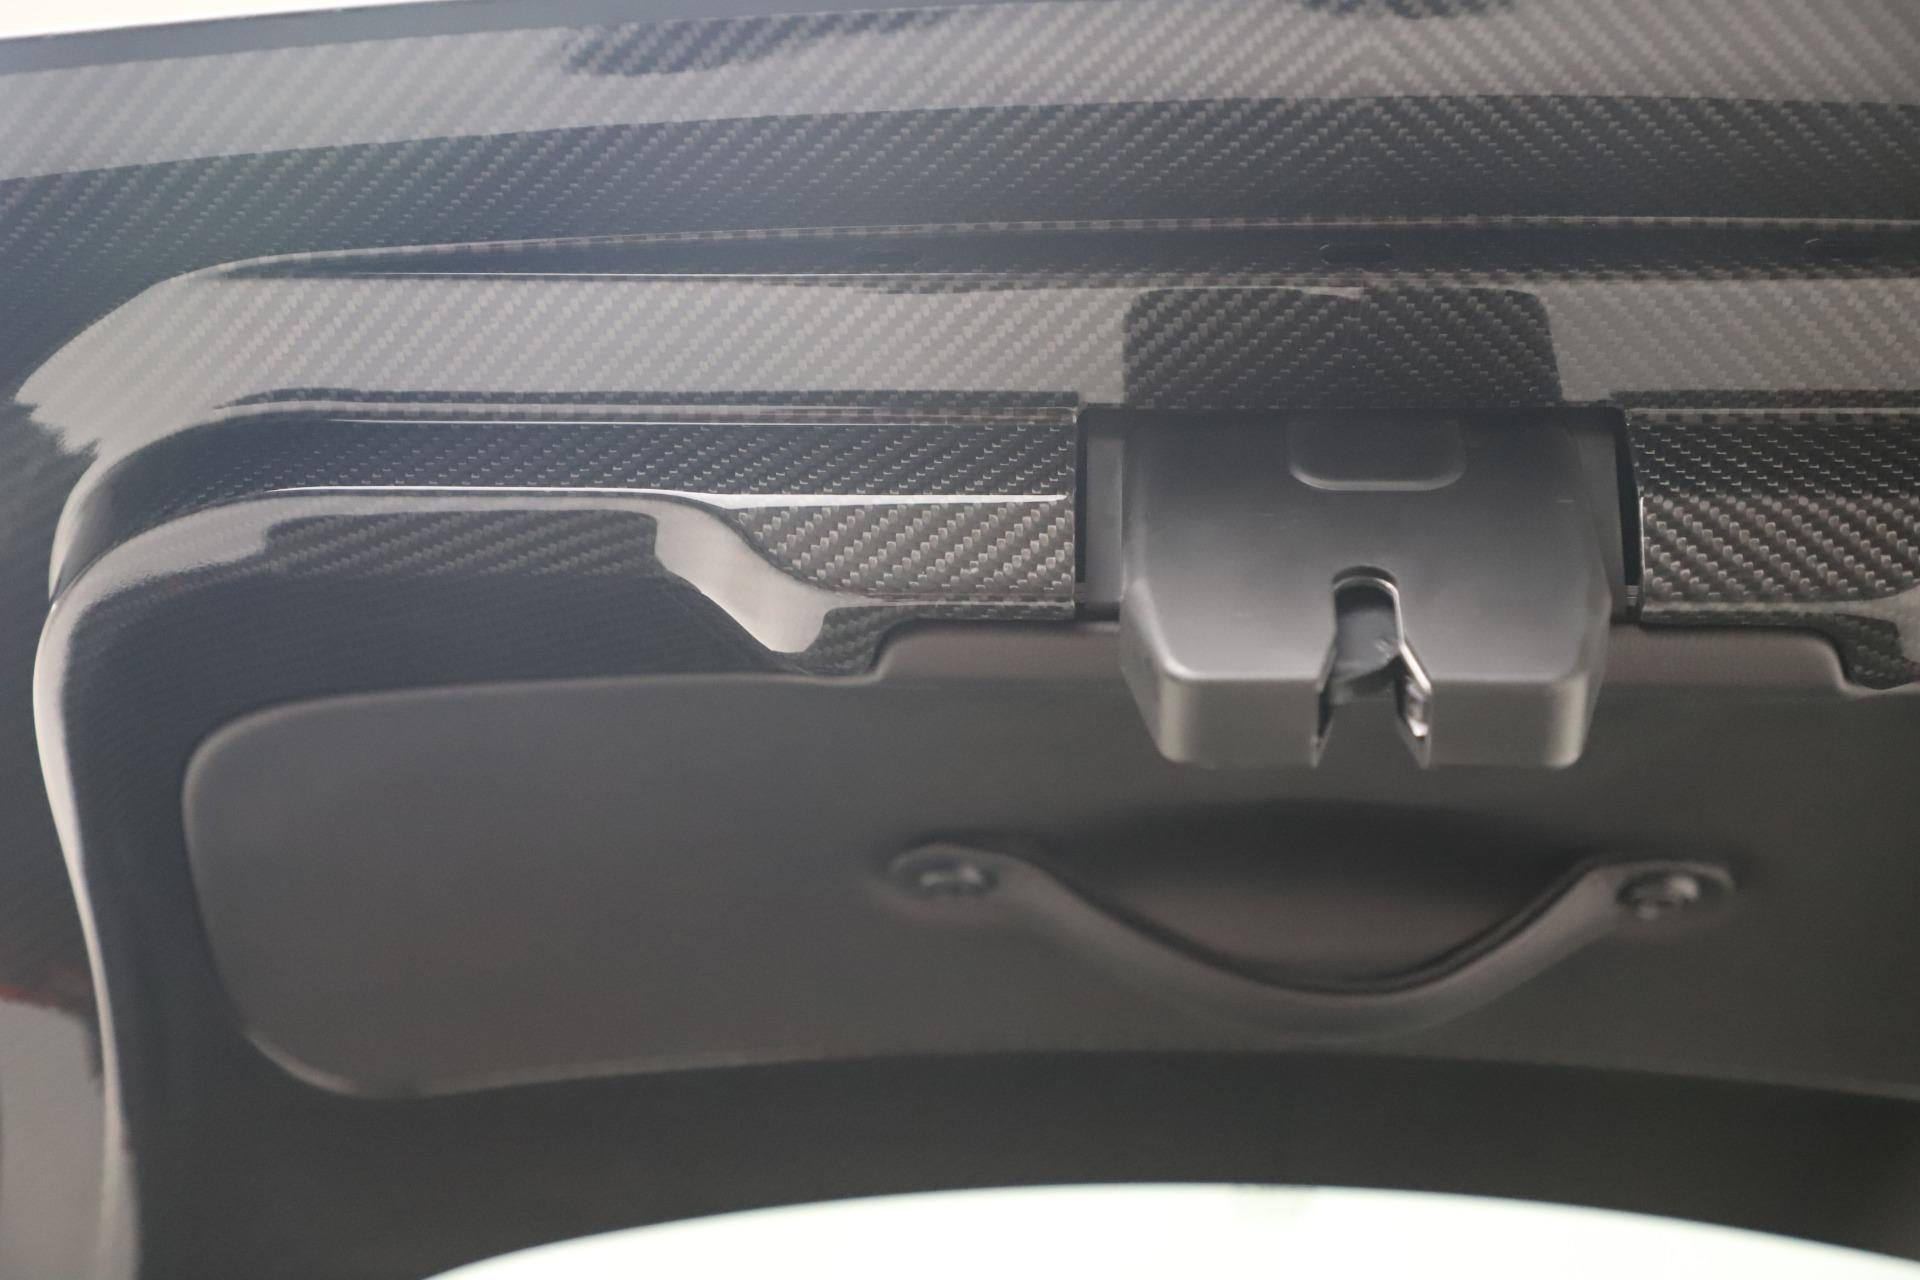 New 2019 Aston Martin Vanquish Shooting Brake For Sale In Westport, CT 3512_p53